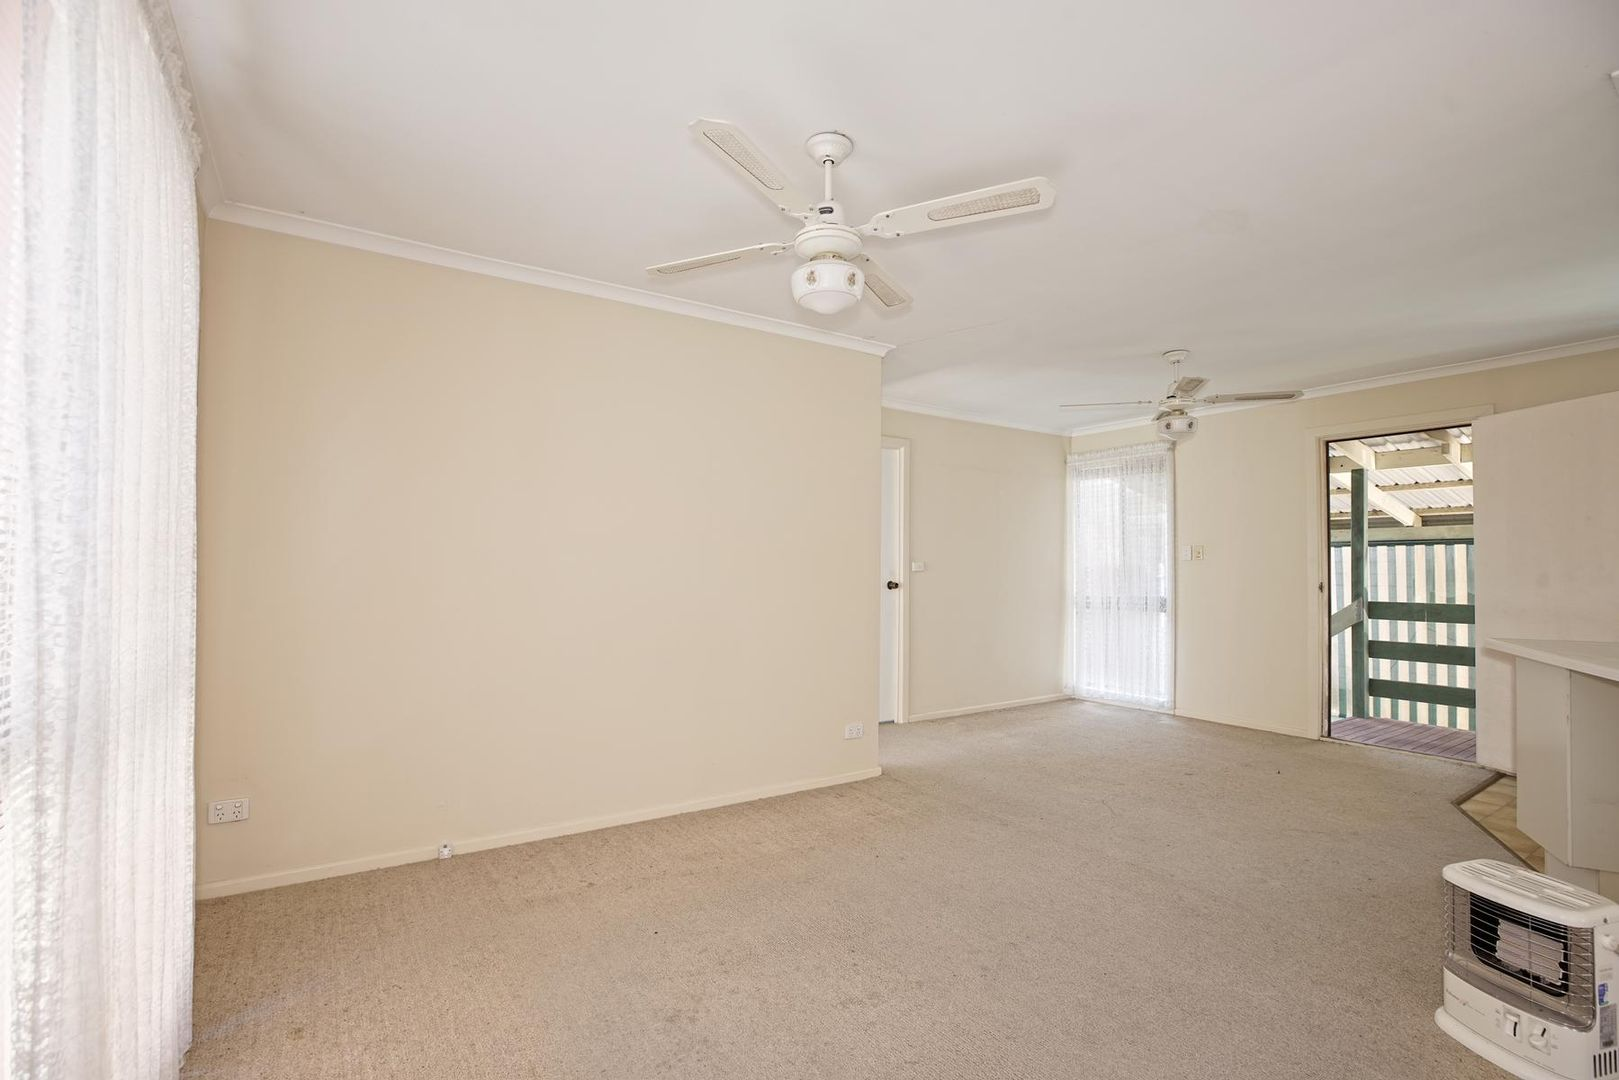 196/6-22 Tench Avenue, Jamisontown NSW 2750, Image 2